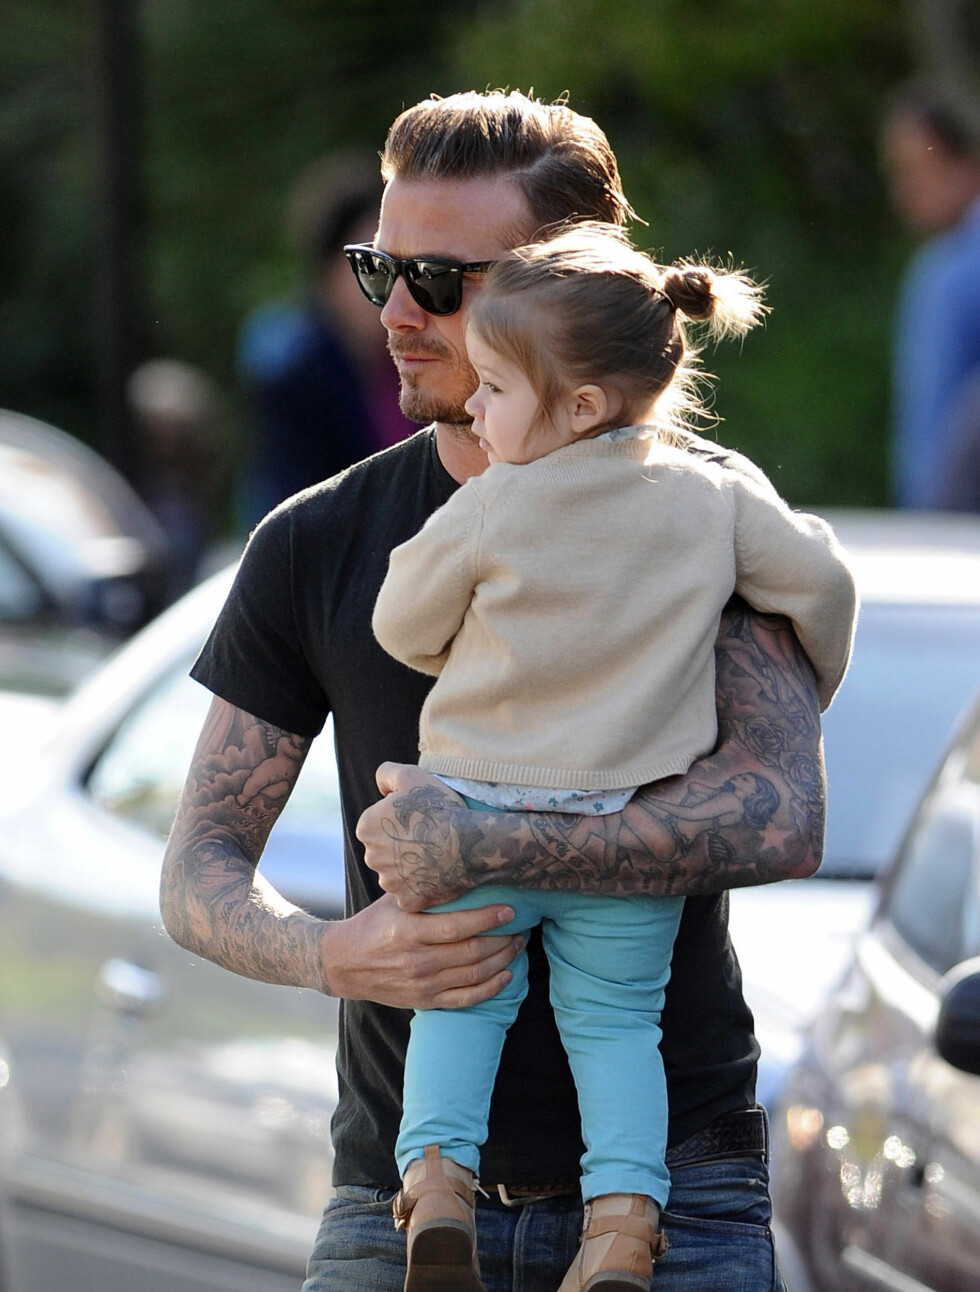 PAPPAKOS: David Beckham med datteren Harper Seven. Hennes navn har pappa beckham fått tatovert like over hjertet sitt.  Foto: Stella Pictures